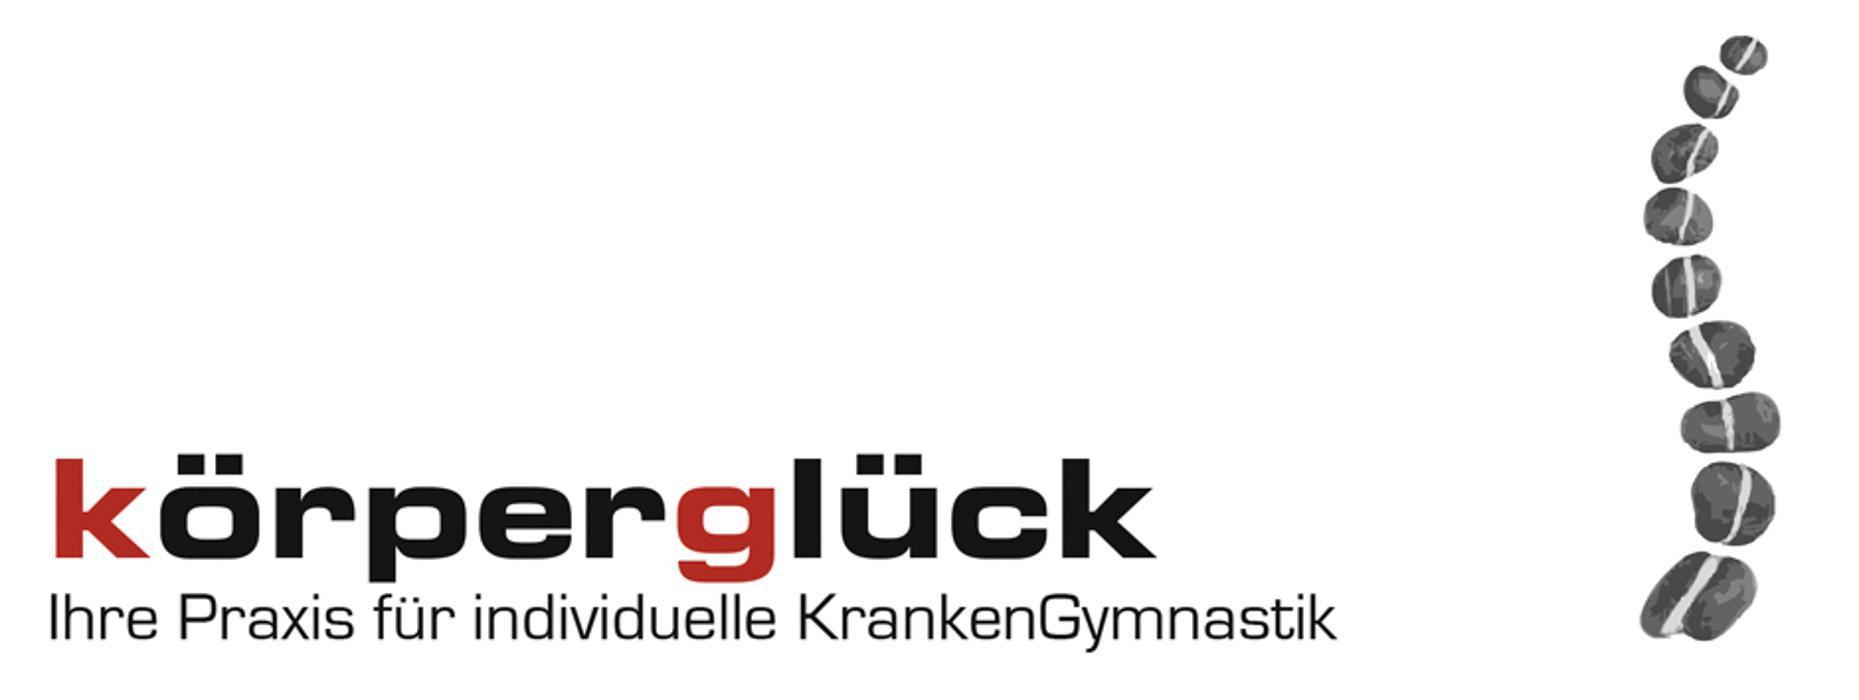 Bild zu Praxis Körperglück in Saarbrücken